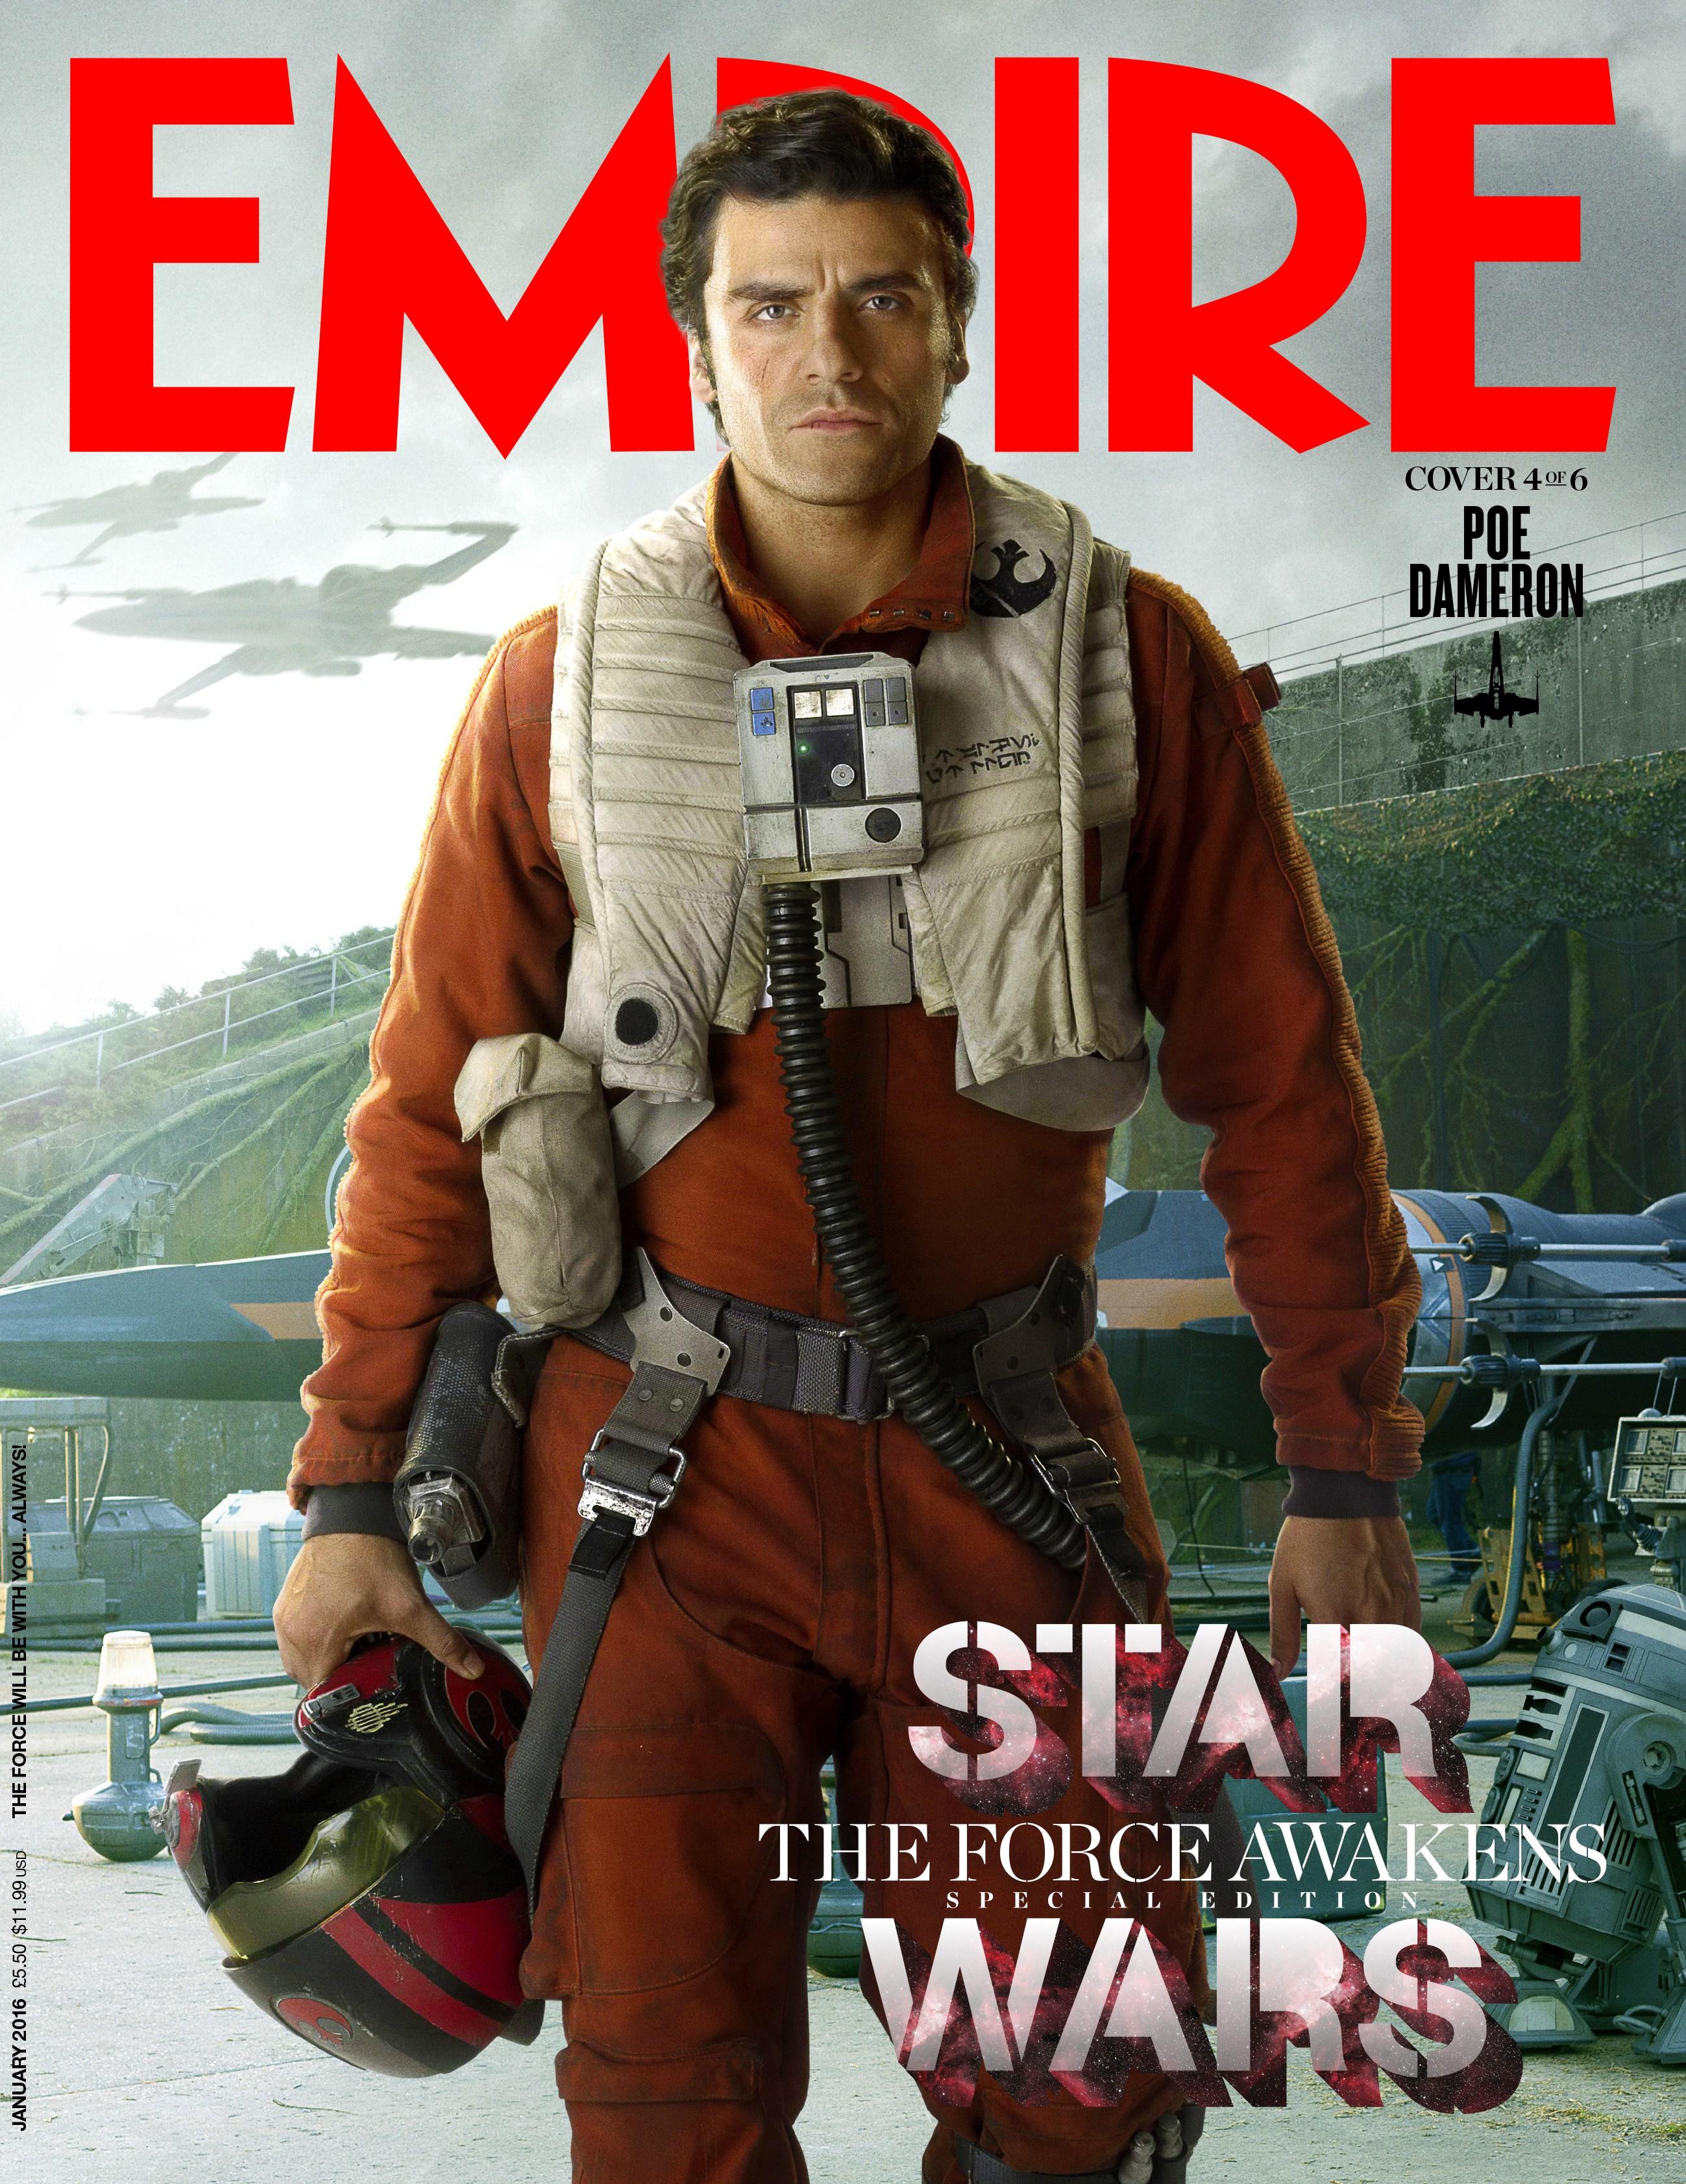 star wars empire magazine coversreggie 39 s. Black Bedroom Furniture Sets. Home Design Ideas